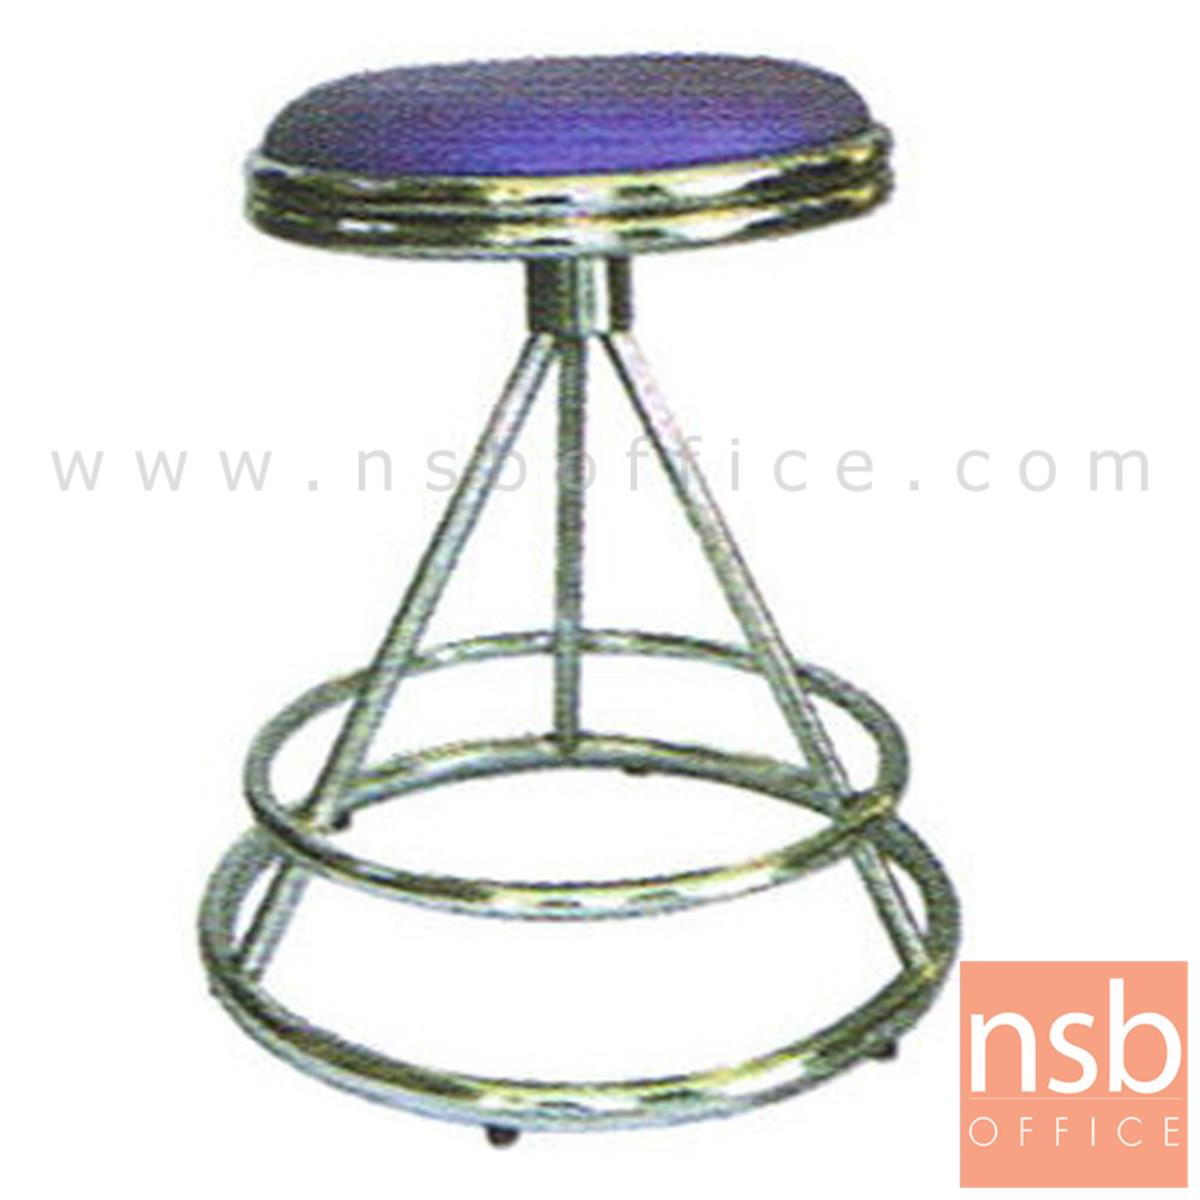 B09A011:เก้าอี้บาร์สตูลที่นั่งกลม รุ่น CS-027 ขาเหล็ก